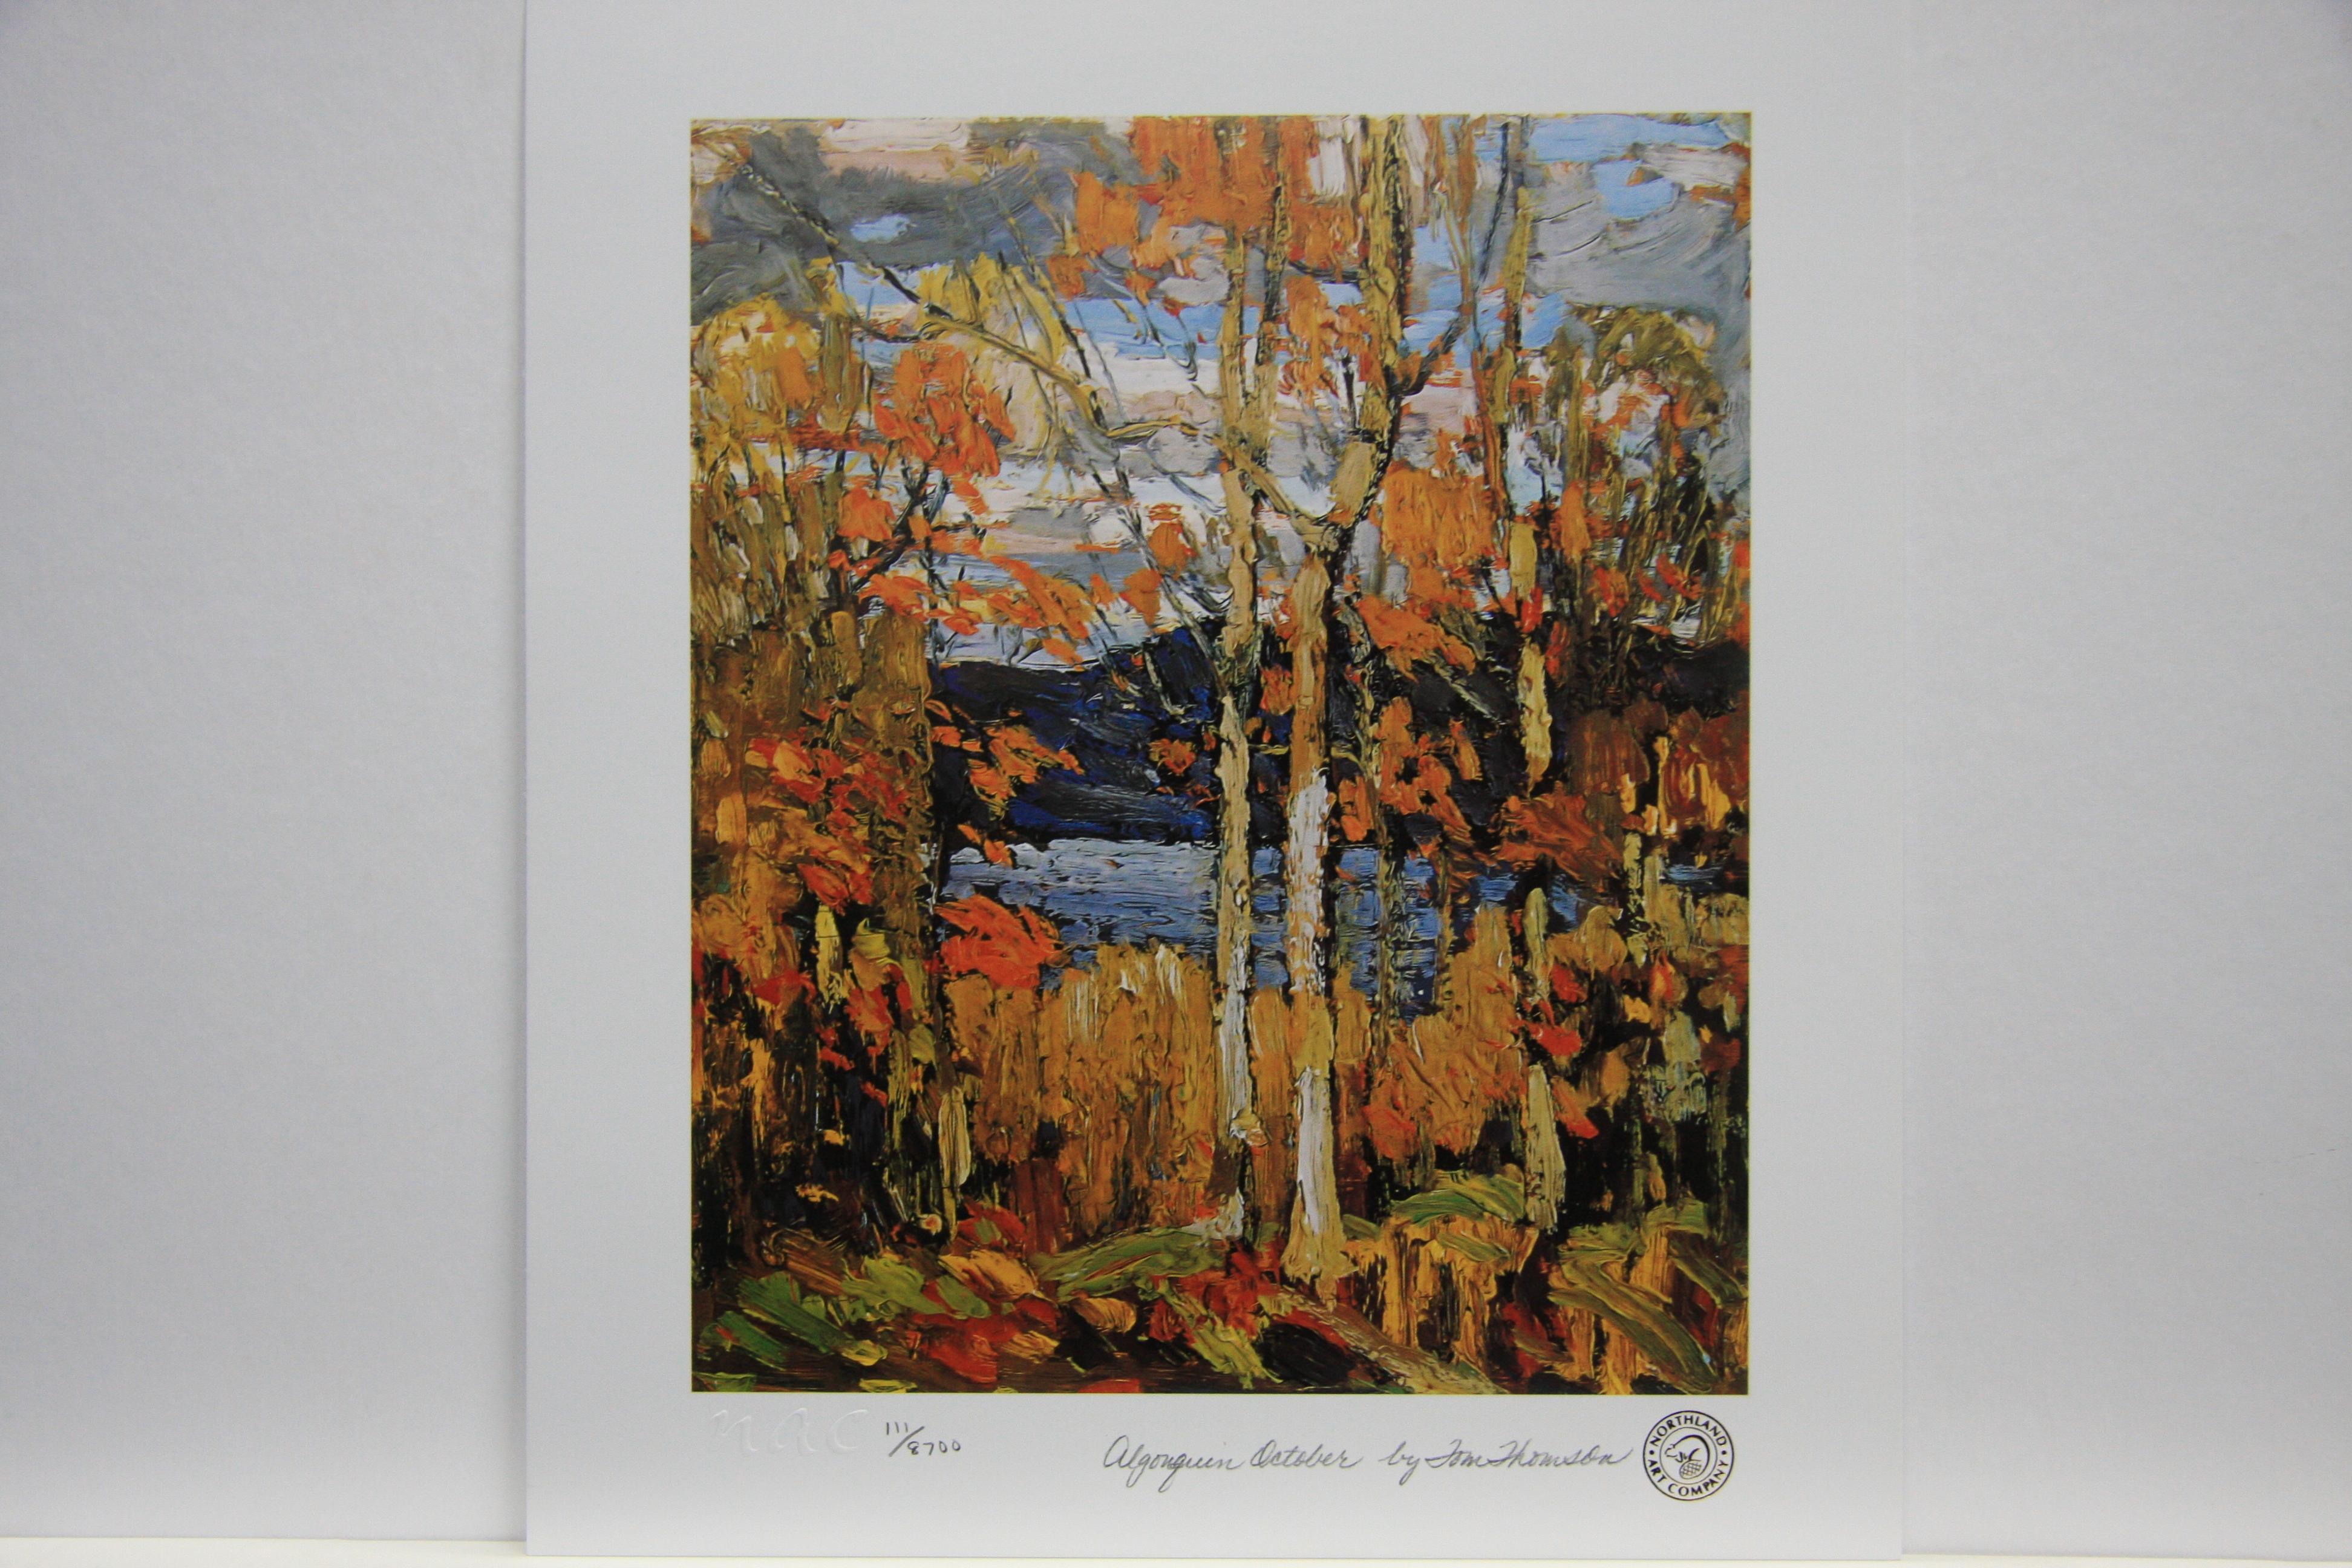 Index Of Images The Wetbrush Watercolor Mossaics Starburst Thomson Algonquin October Full